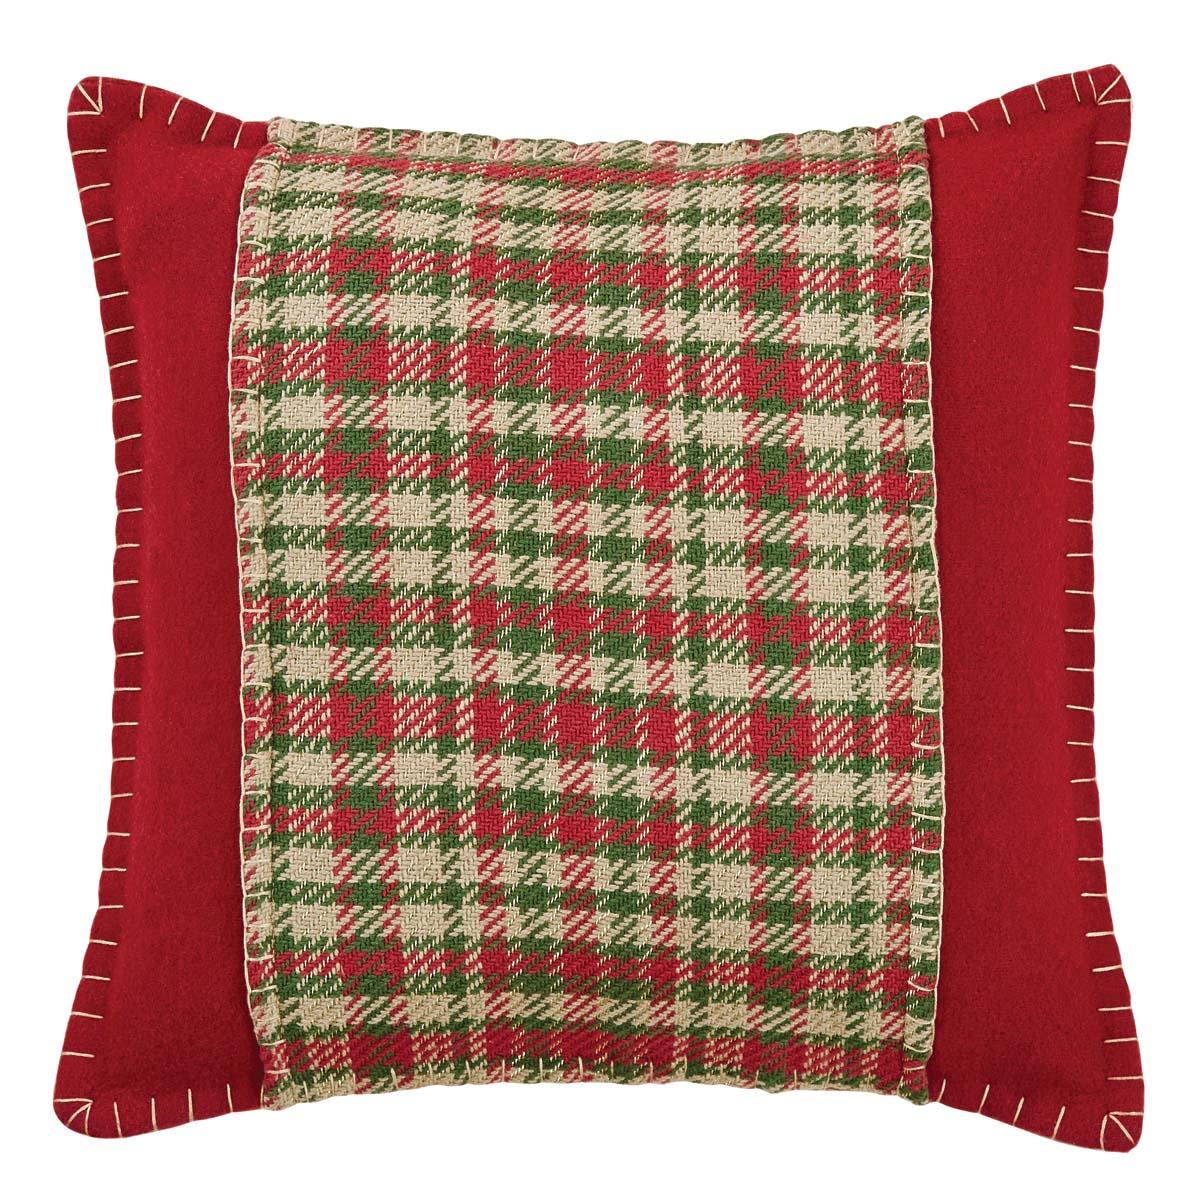 Claren Appliqued Pillow 16x16